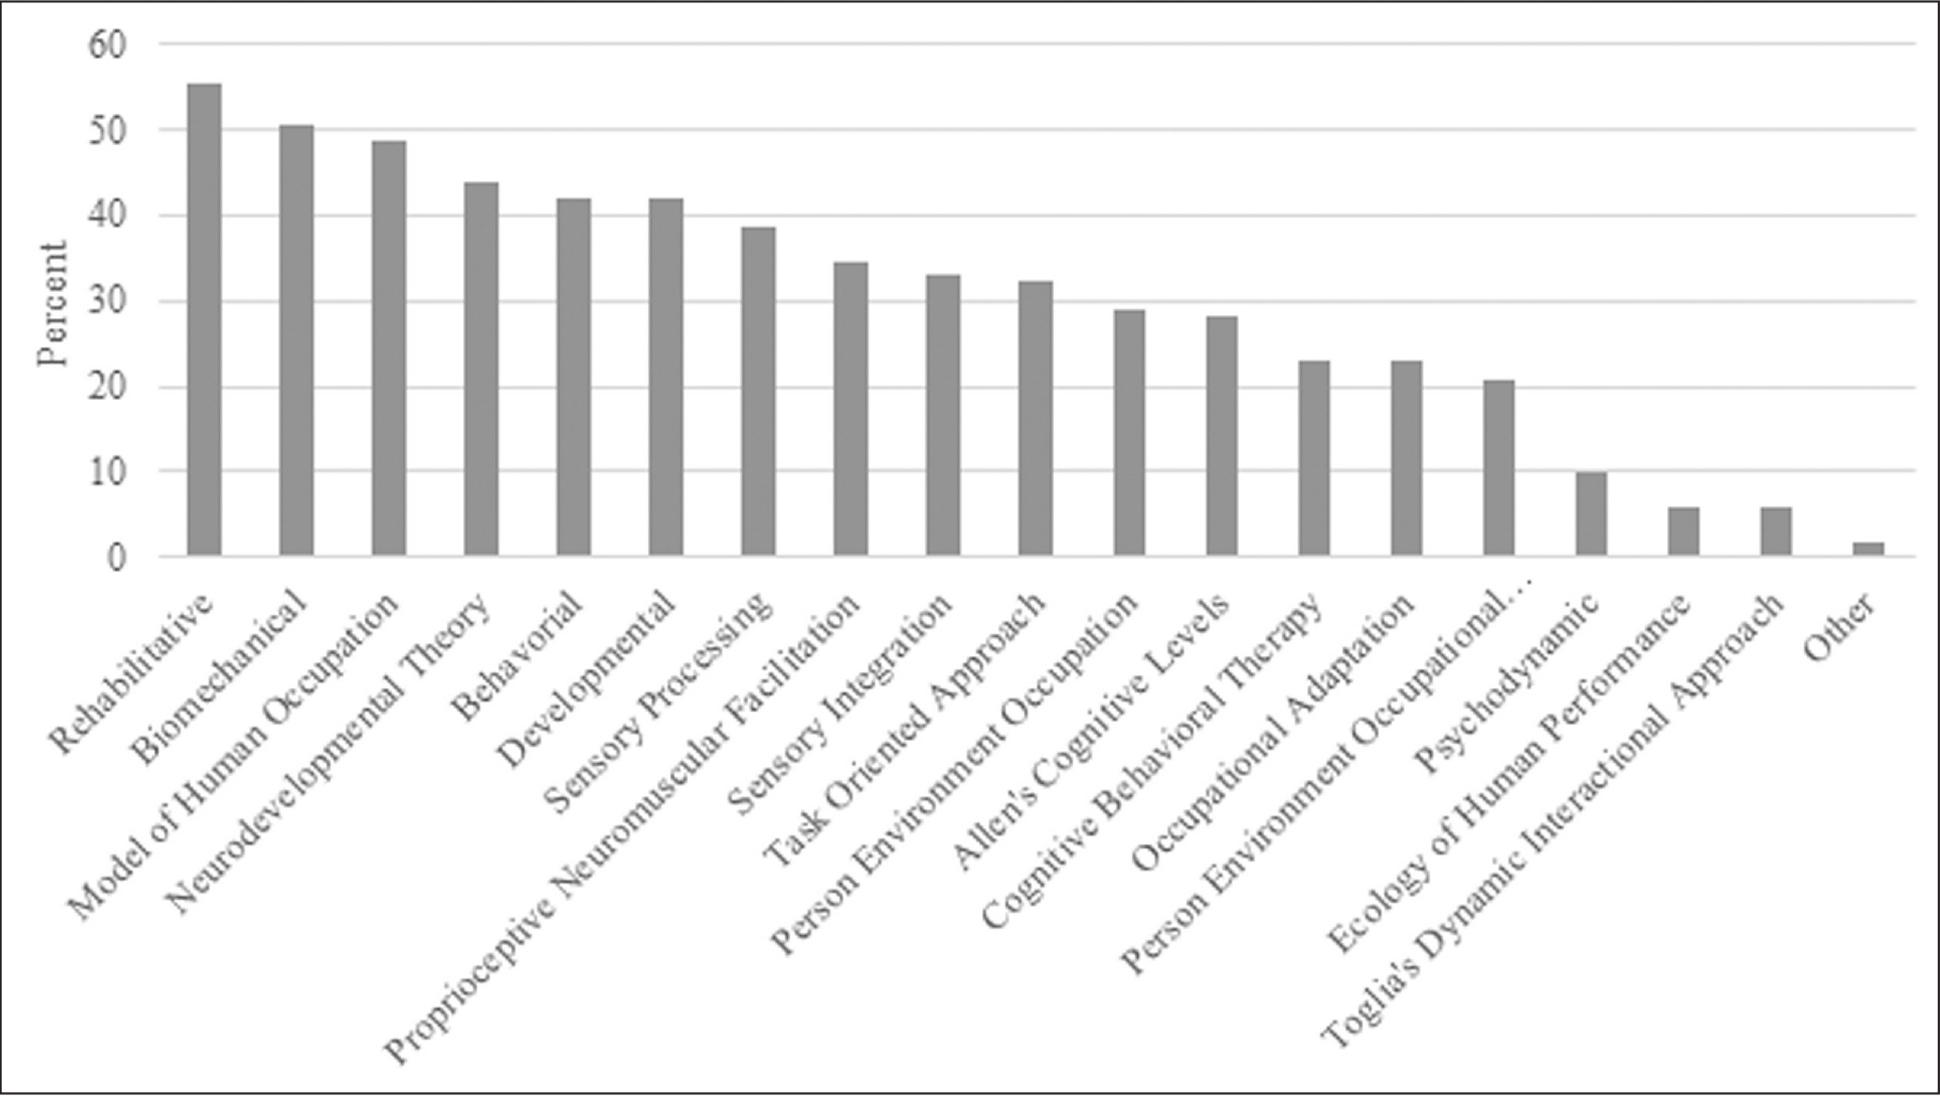 Occupation-Based Practice: A U.S. Survey